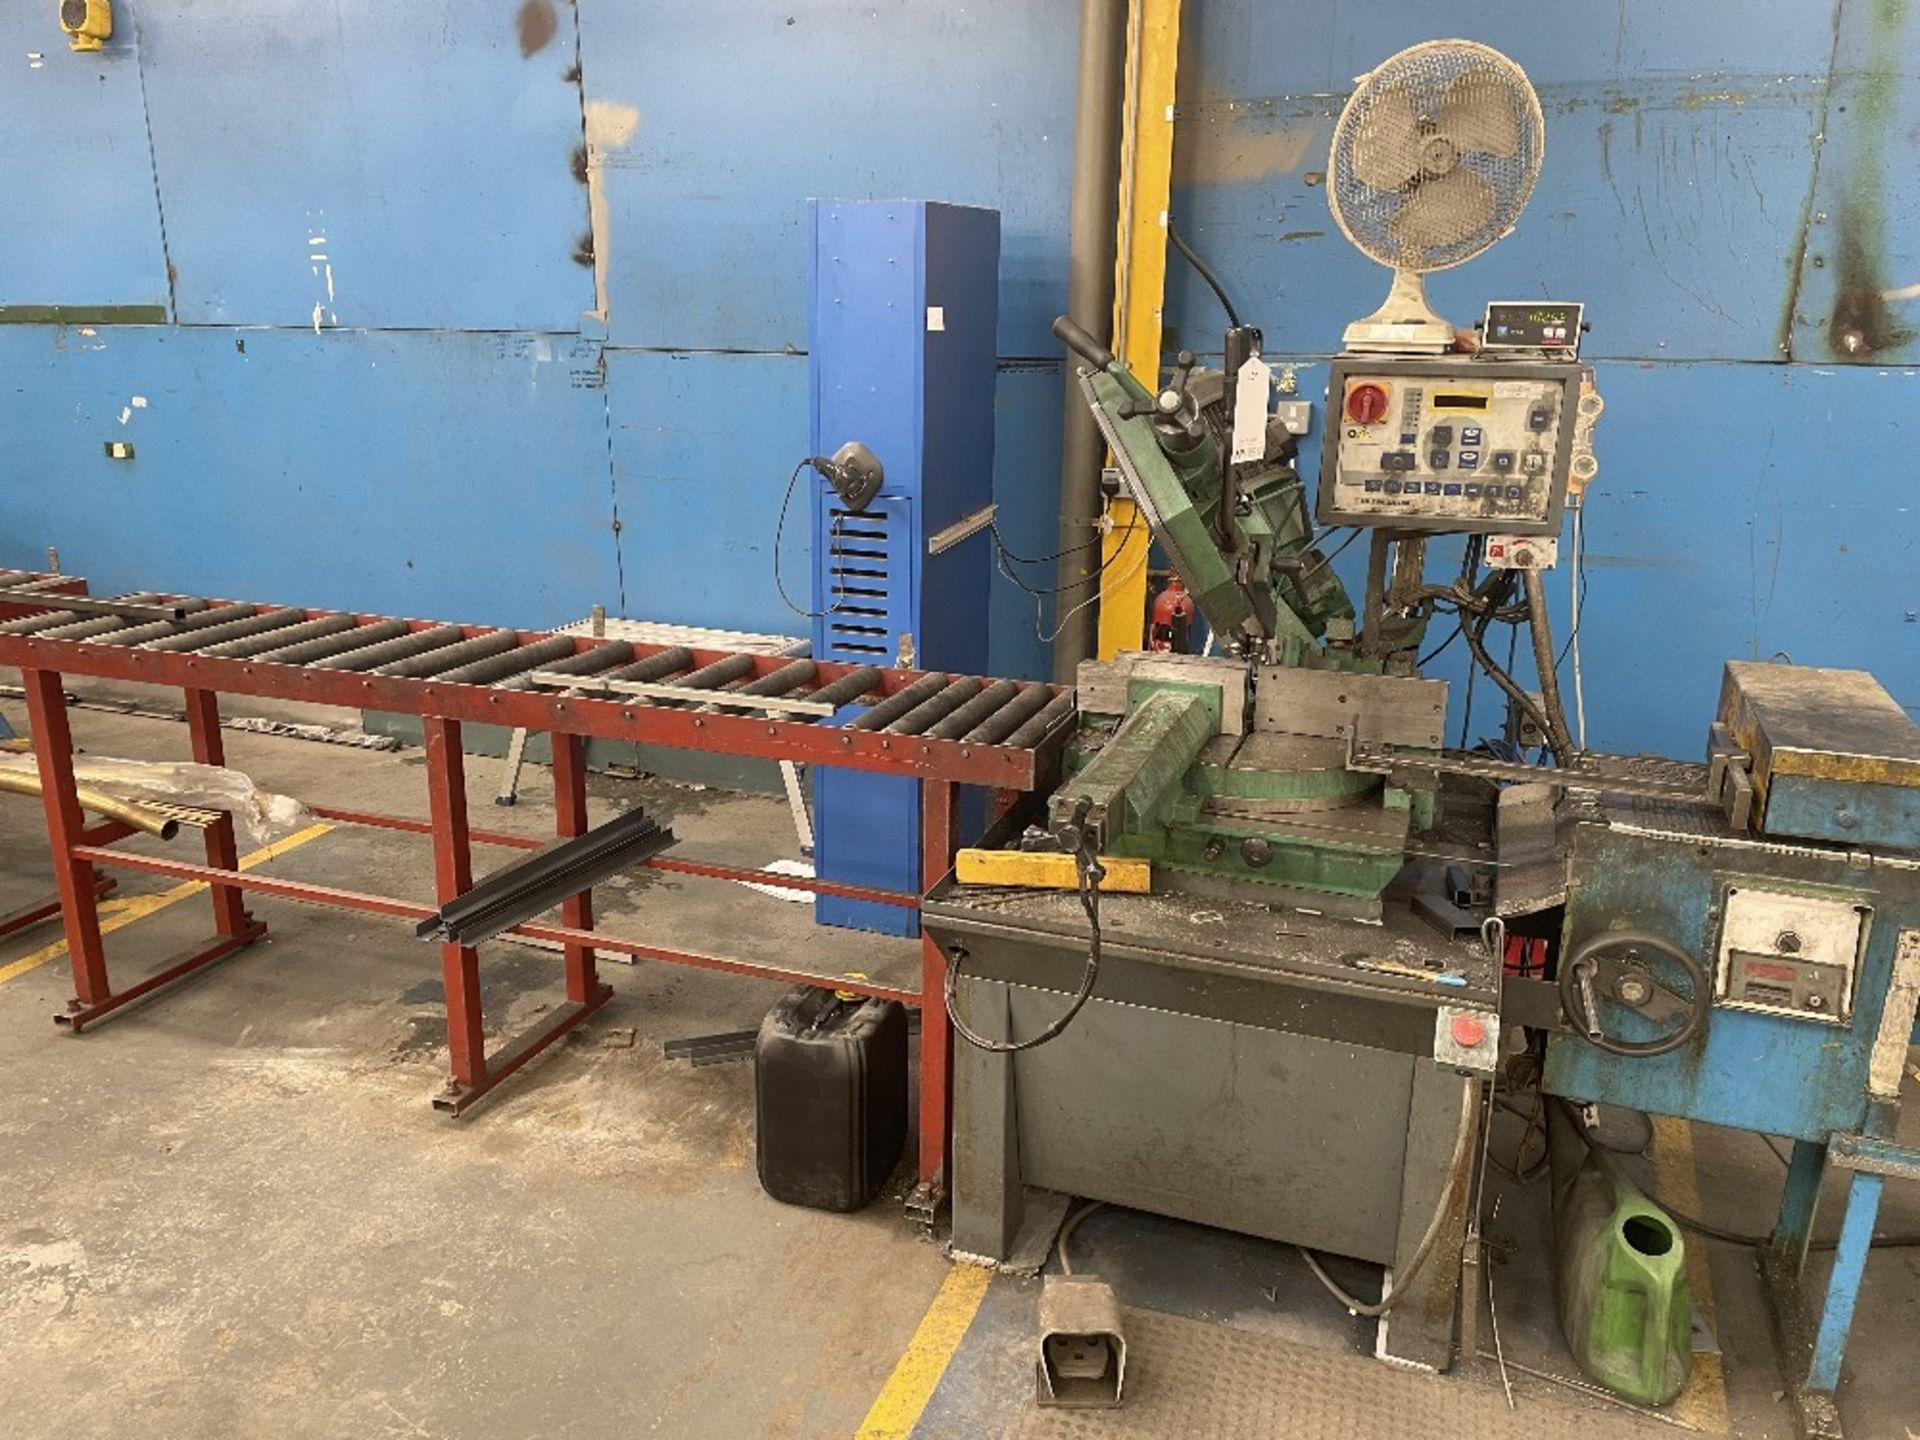 Pedrazzoli Brown SC 300 Horizontal Bandsaw w/ 4m Powered Conveyor - Image 7 of 12